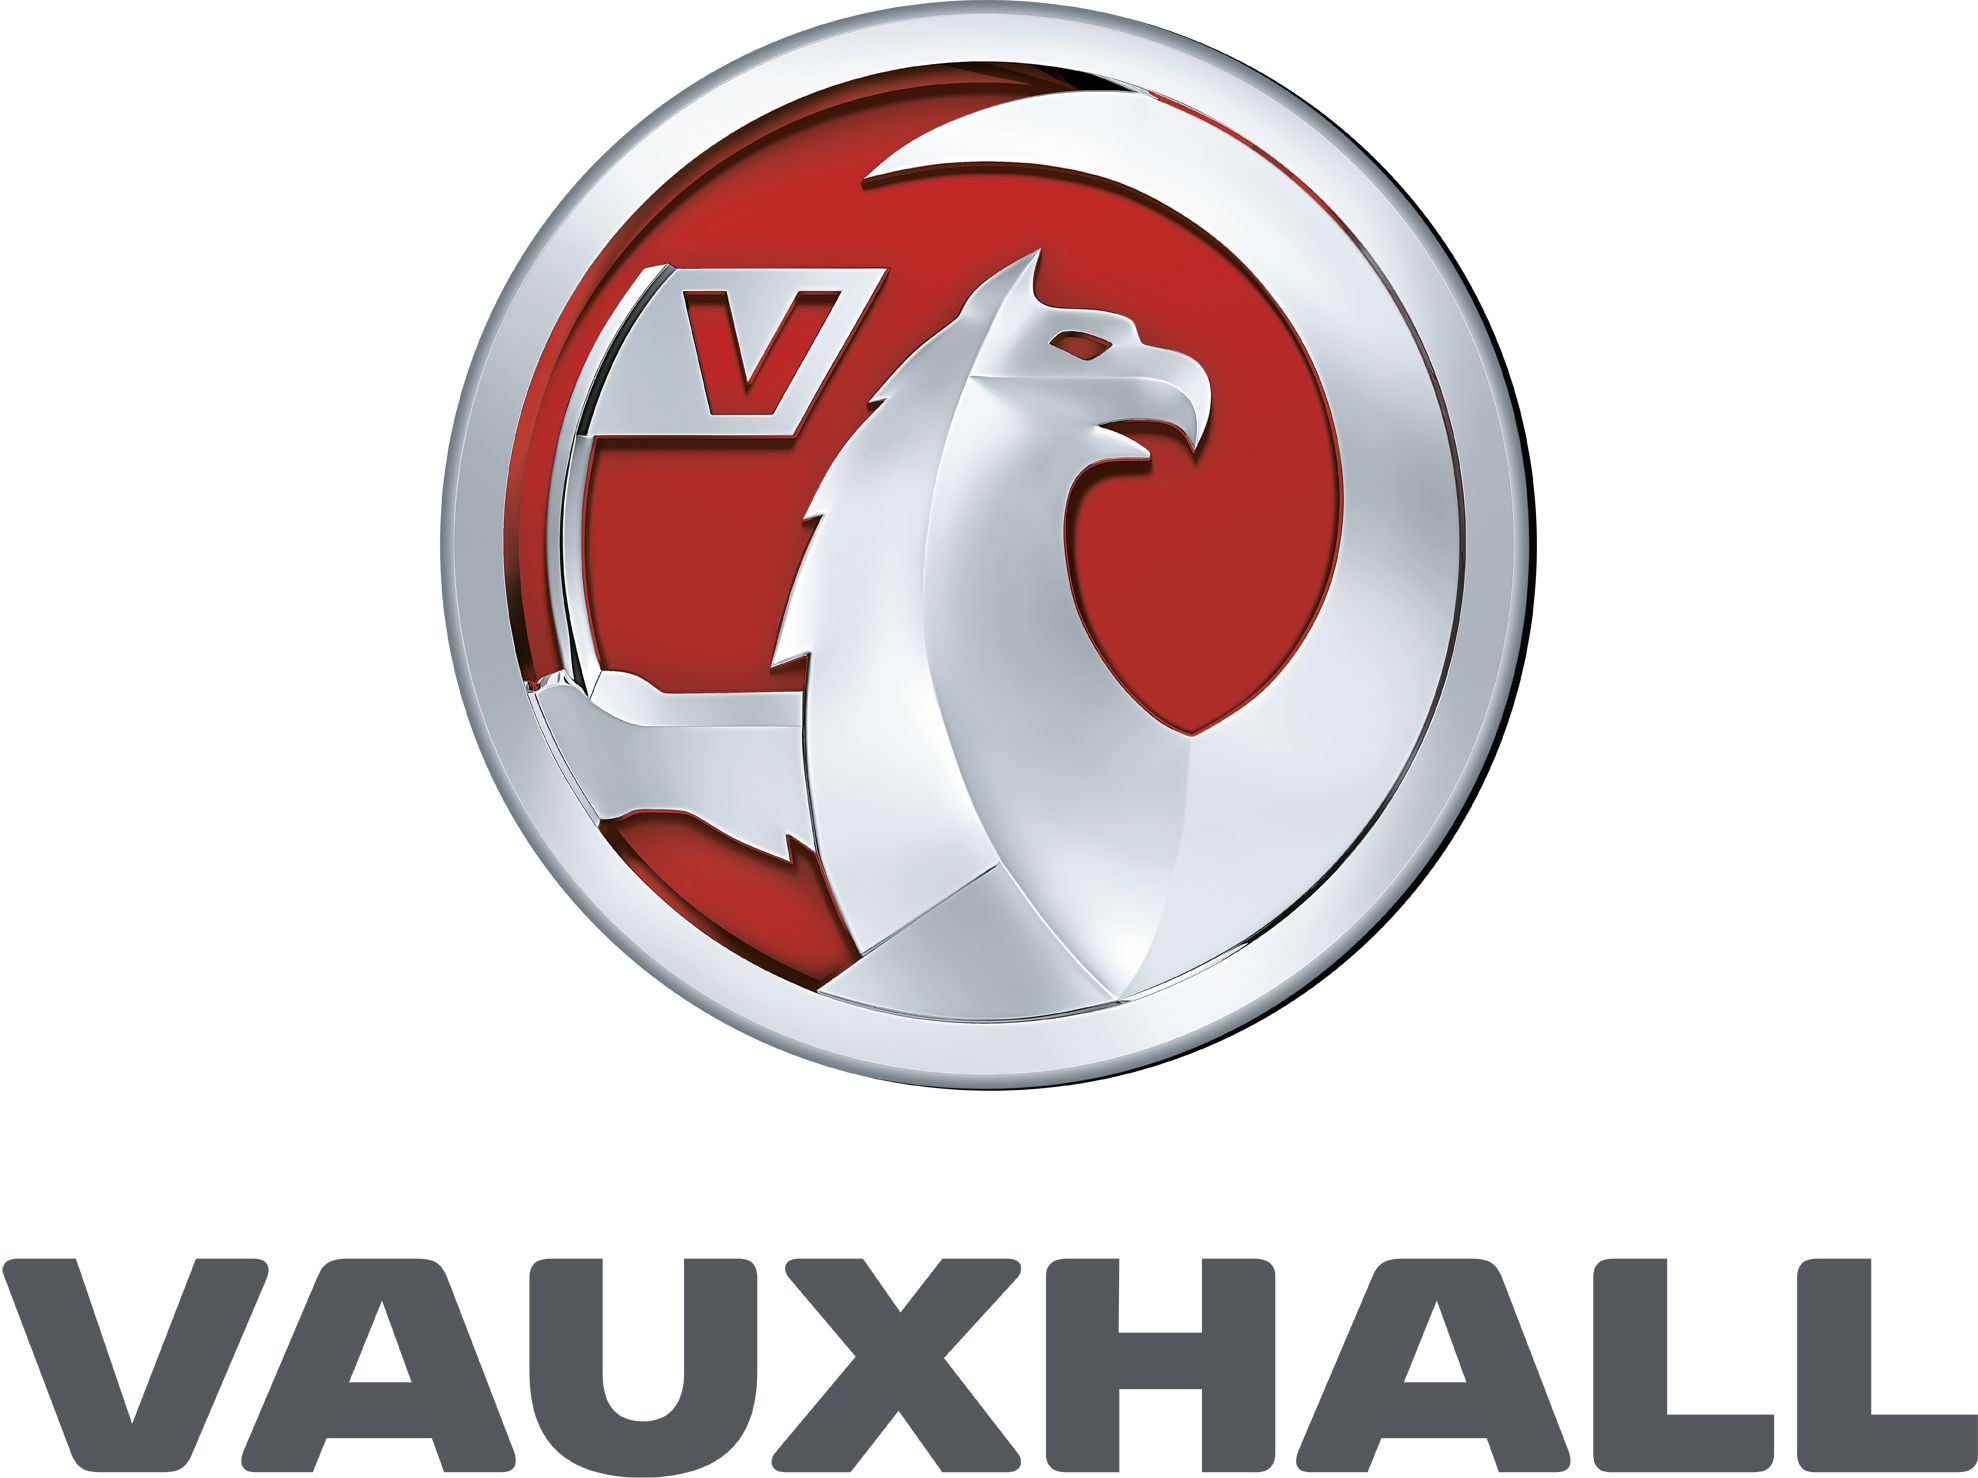 Vauxhall Logo Vauxhall motors, Vauxhall insignia, Car logos